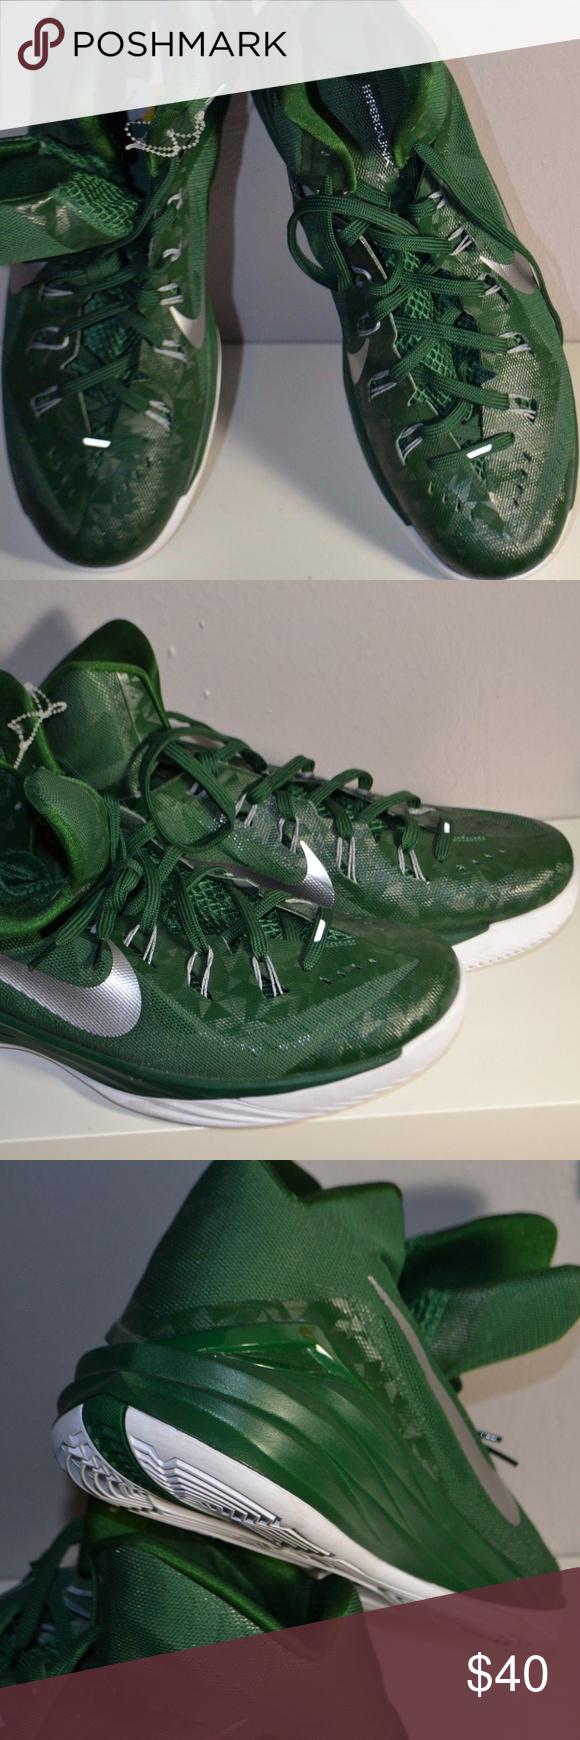 timeless design 5979c 2166d Nike Hyperdunk Lunarlon Basketball Kobe Sneakers NEW Nike Hyperdunk  Lunarlon Green Silver Basketball Kobe Sneakers Shoes Sz 17.5 685777-301  Nike Shoes ...